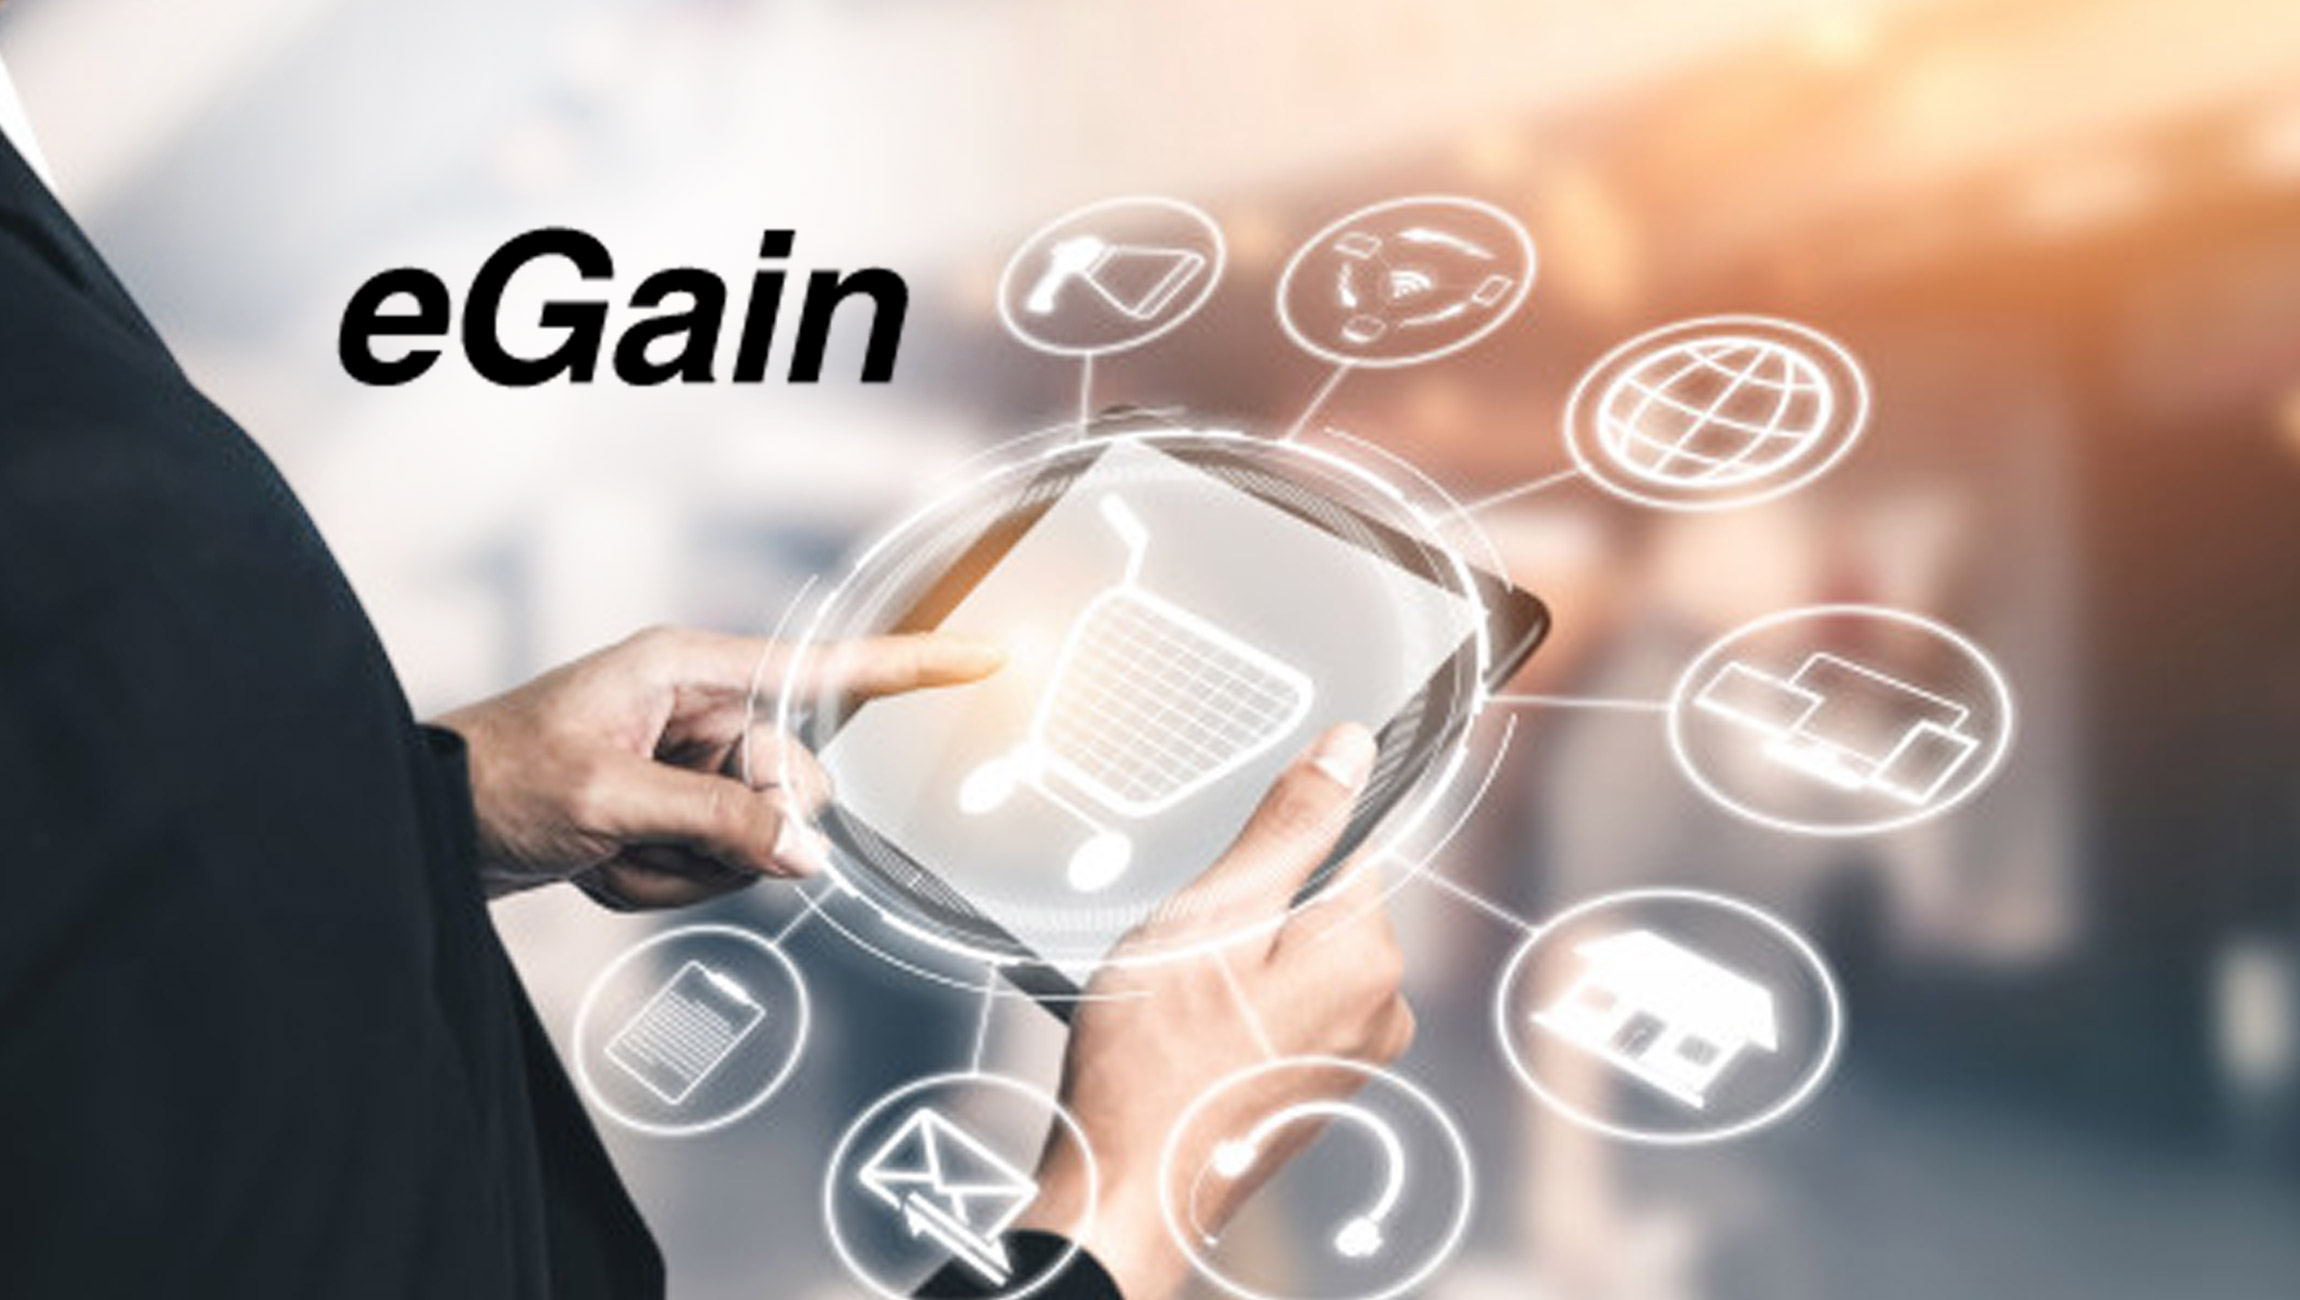 Hypergrowth Retailer Automates Digital Shopper Engagement With eGain